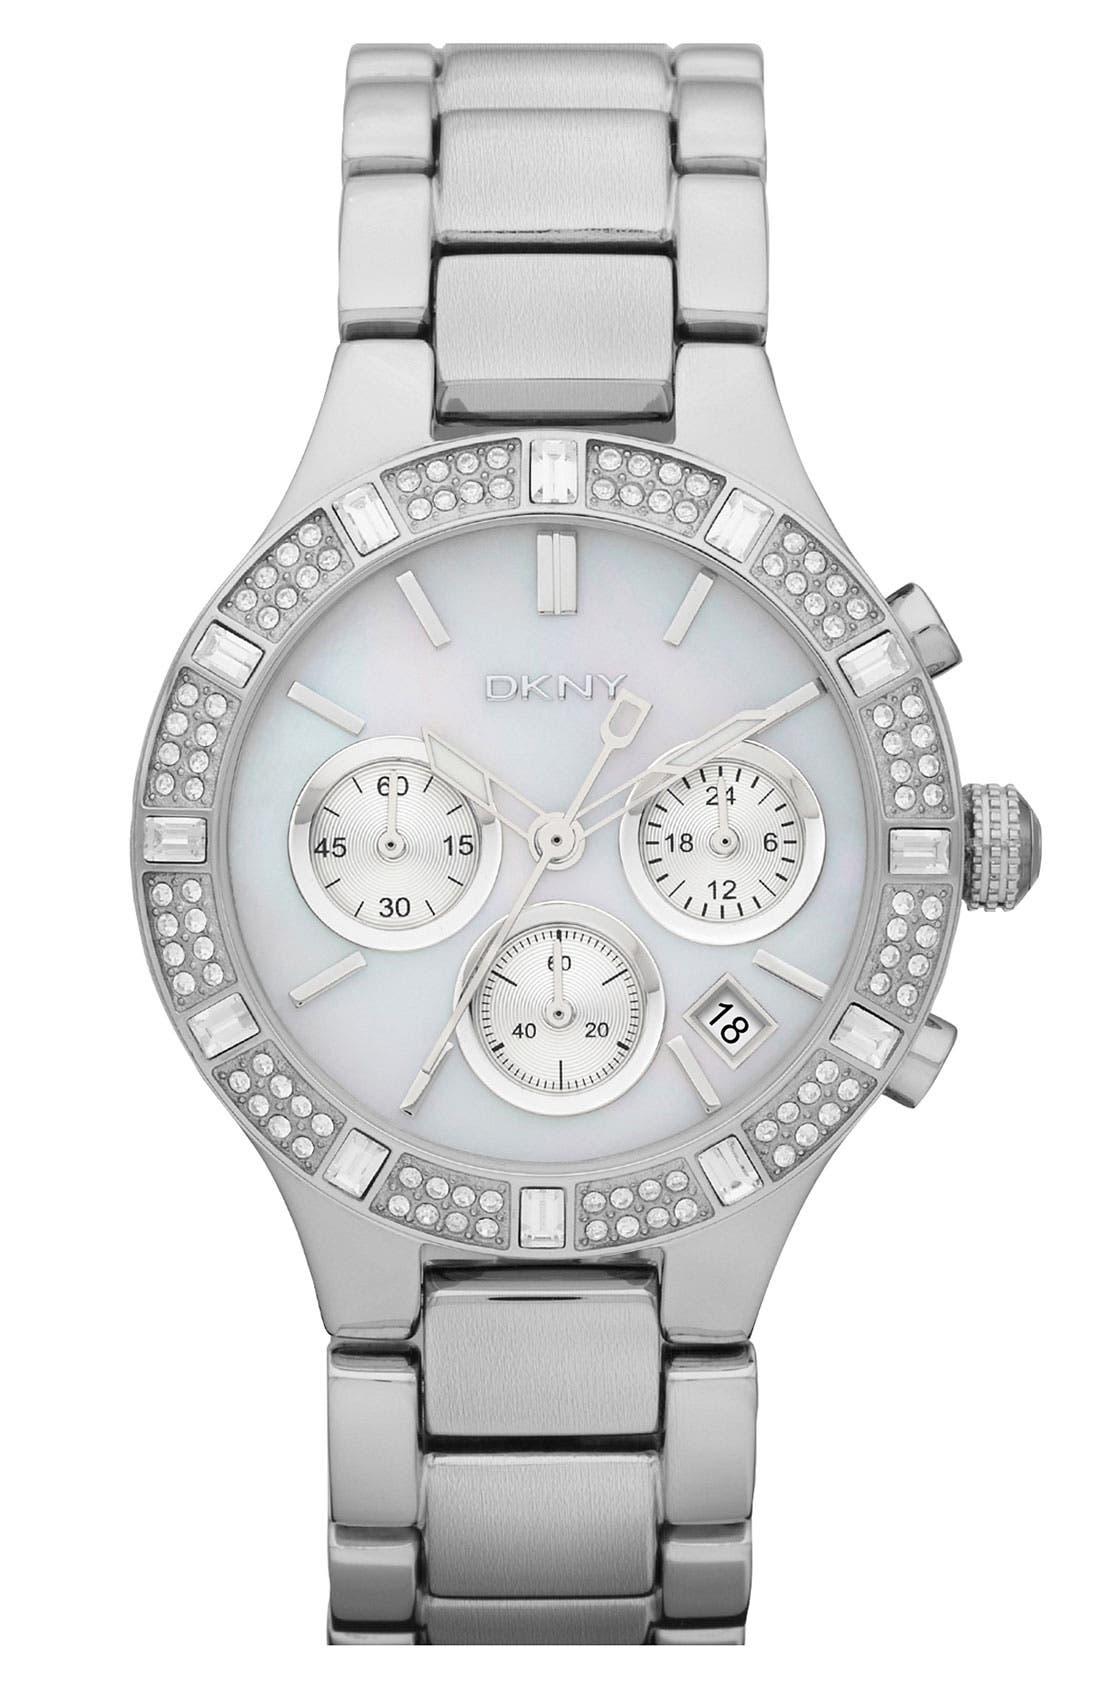 Main Image - DKNY 'Chambers' Medium Round Chronograph Watch, 38mm